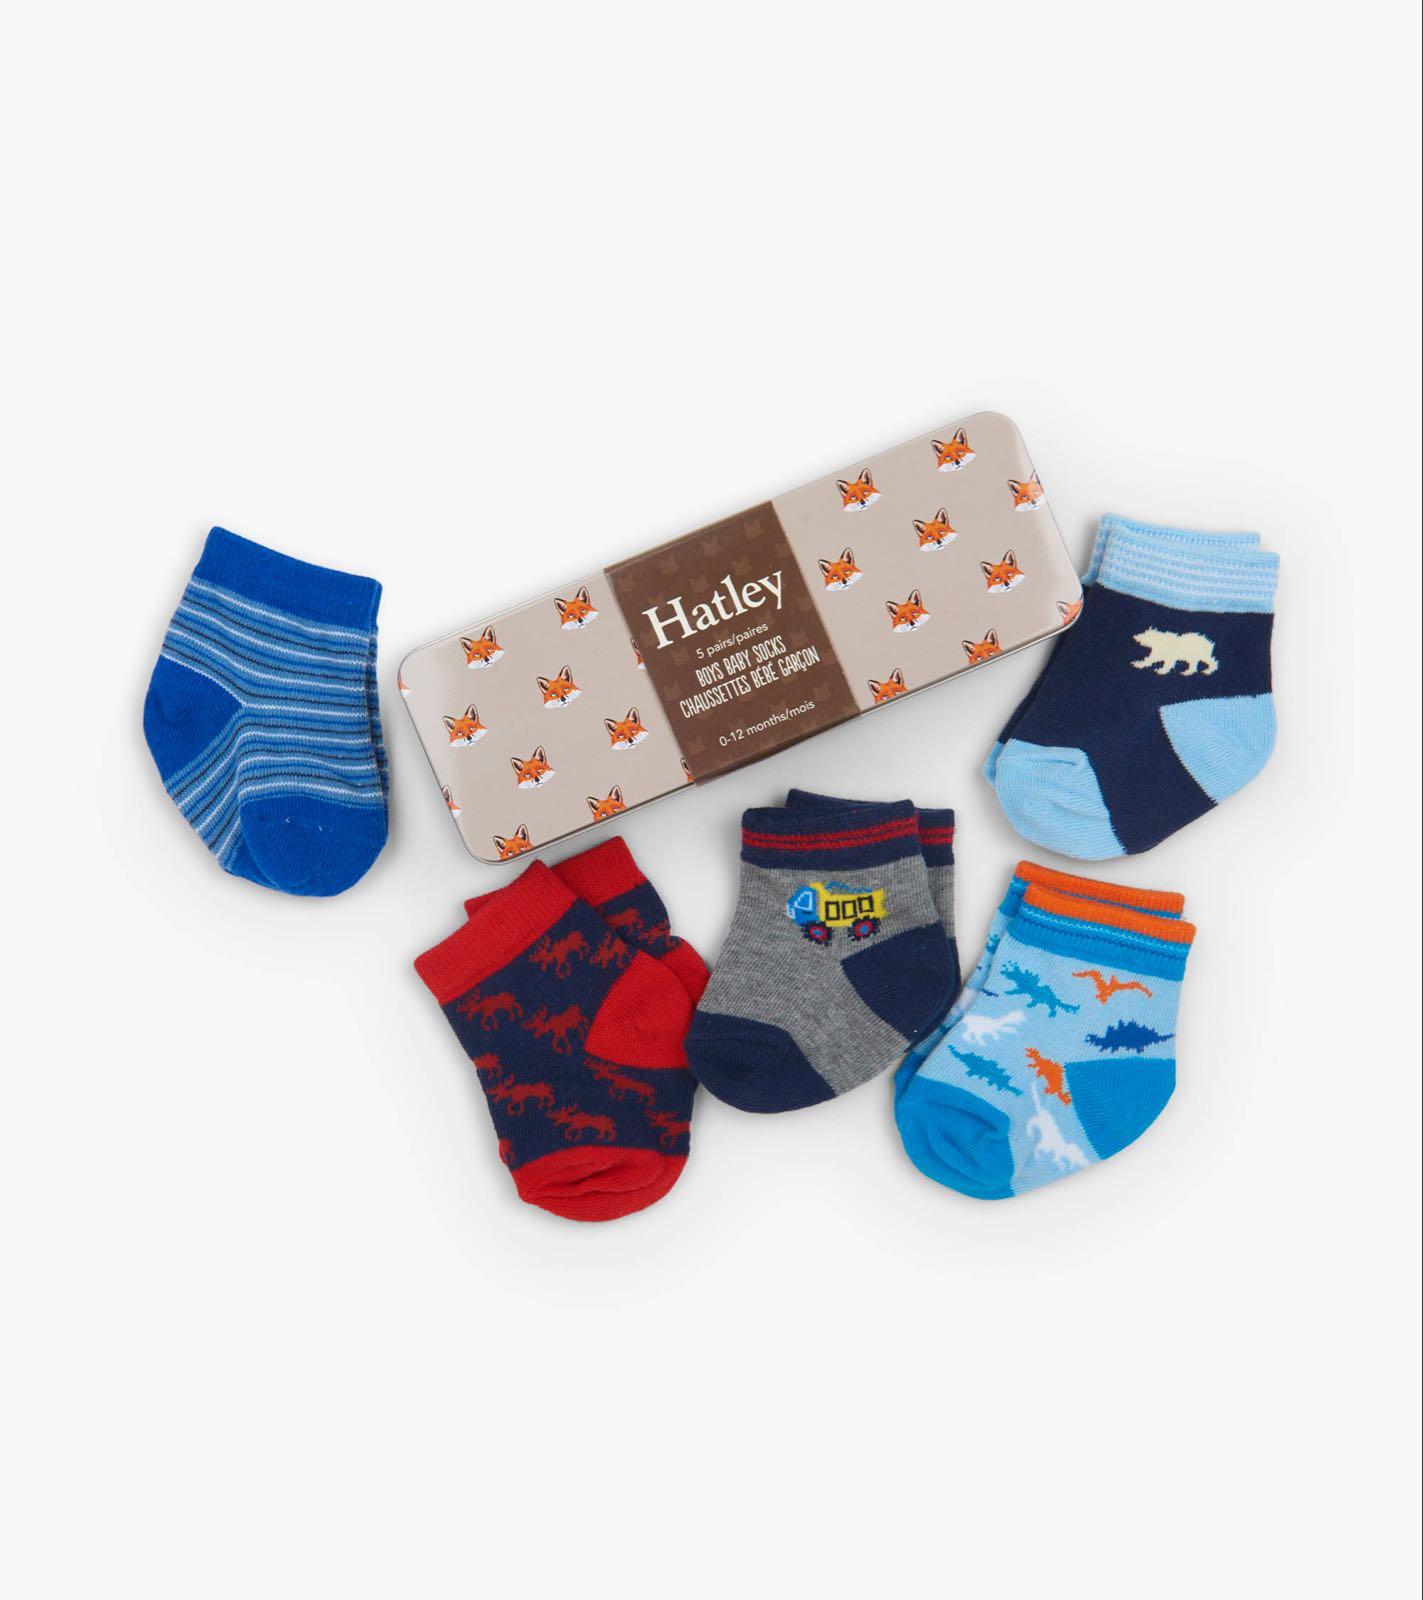 Hatley Socks in a Tin